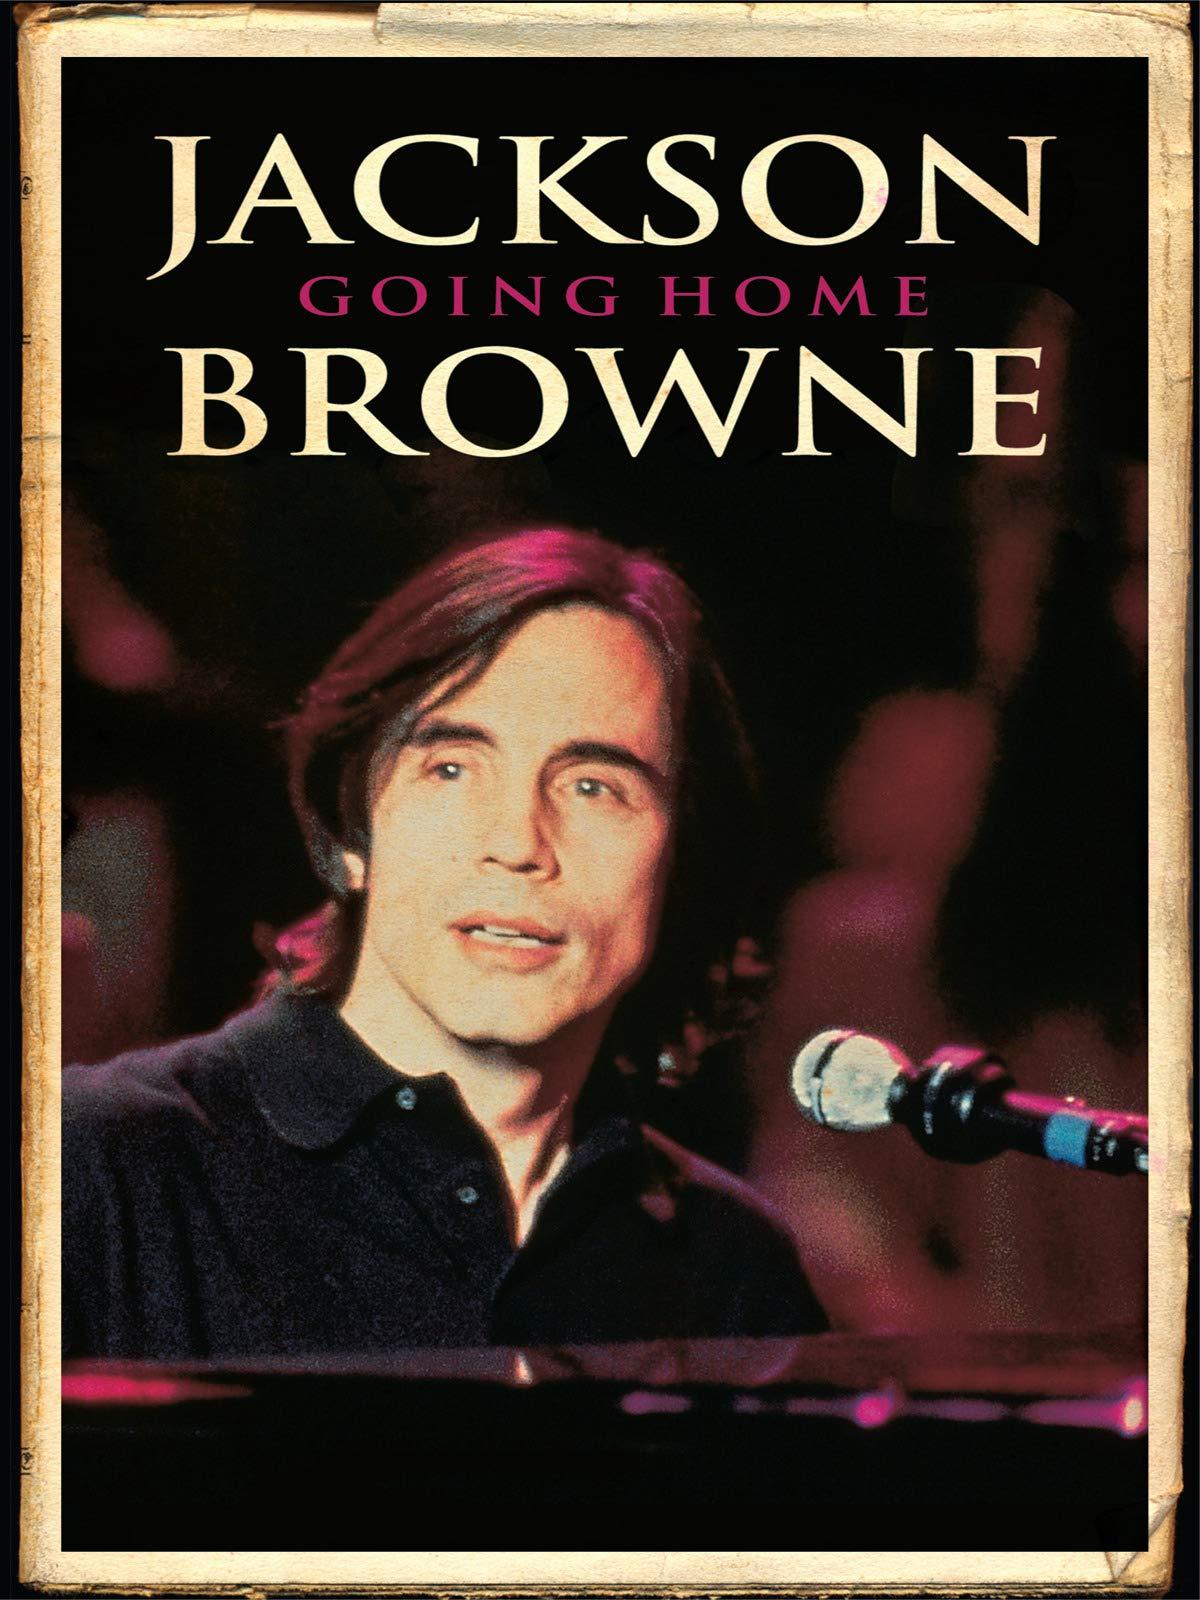 Jackson Browne - Going Home